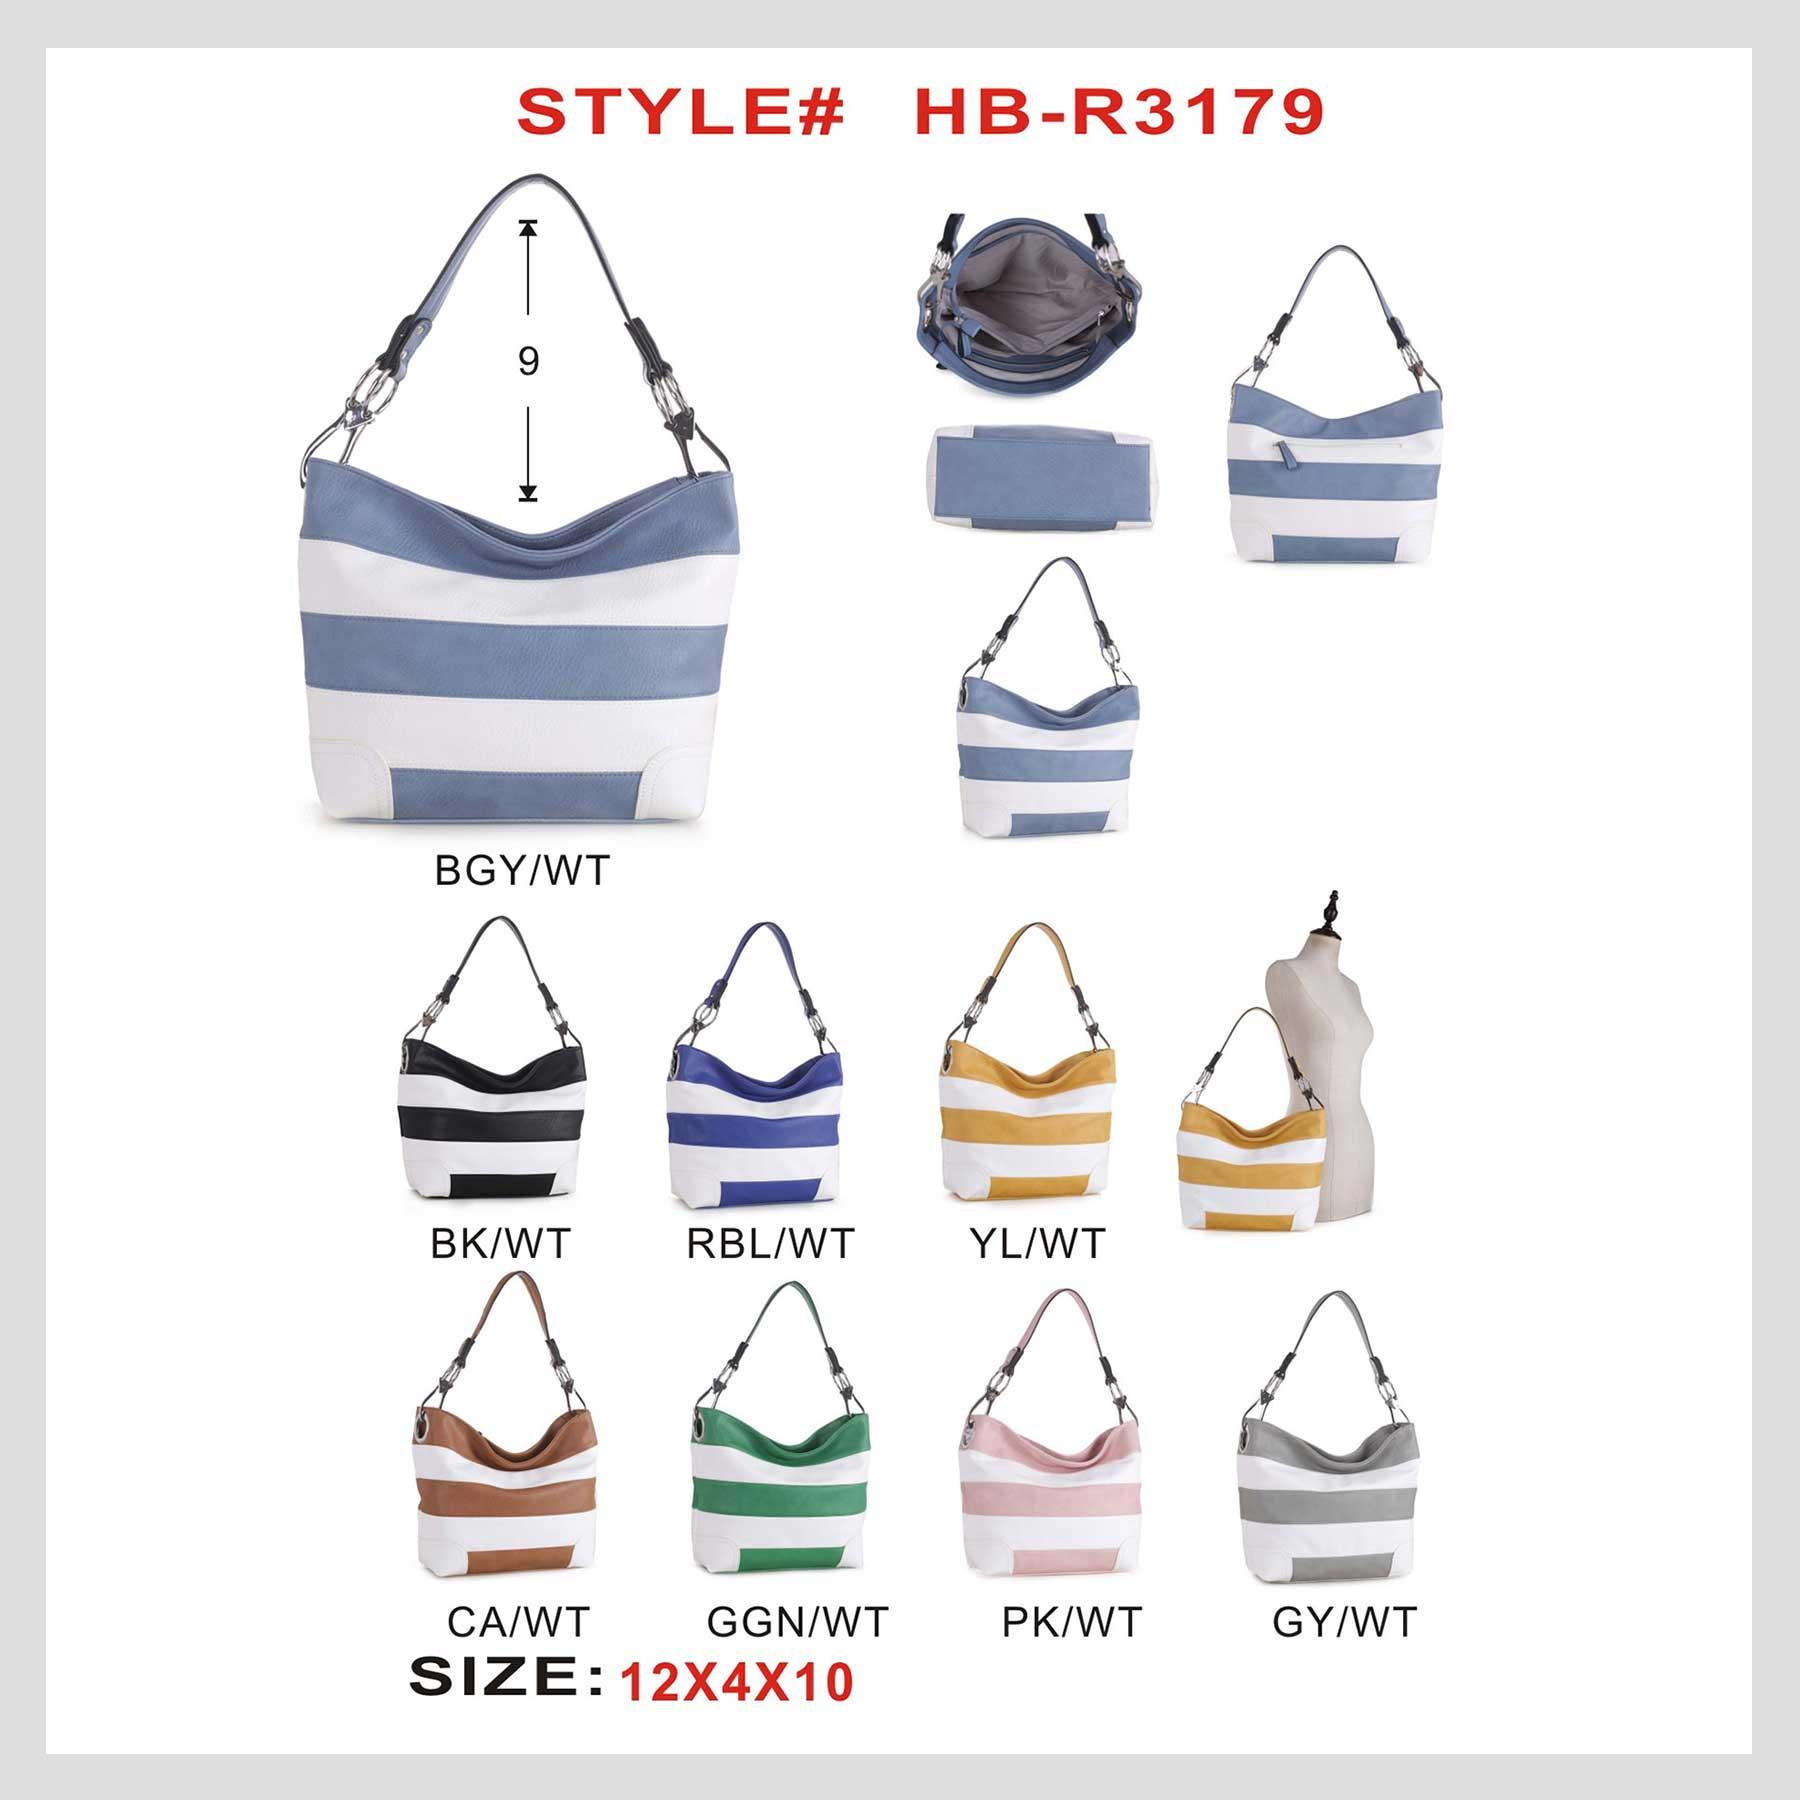 HB-R3179.jpg